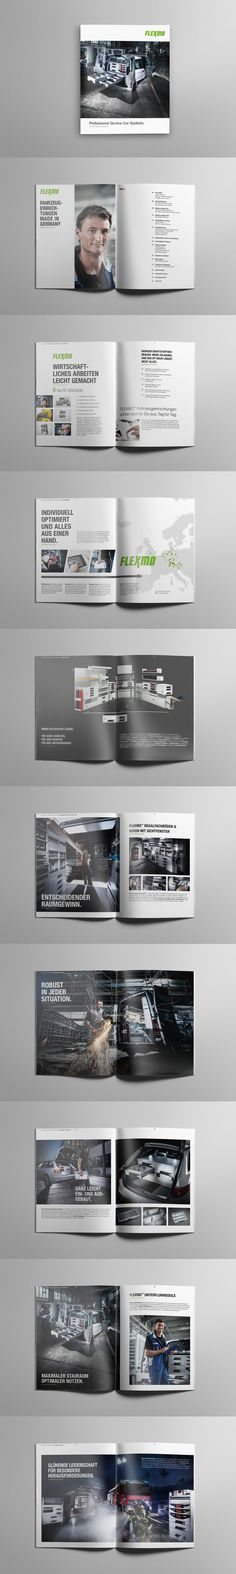 Flexmo | Imagebroschüre #print #imagebrochure #brochure #catalog #magazine #broschüre